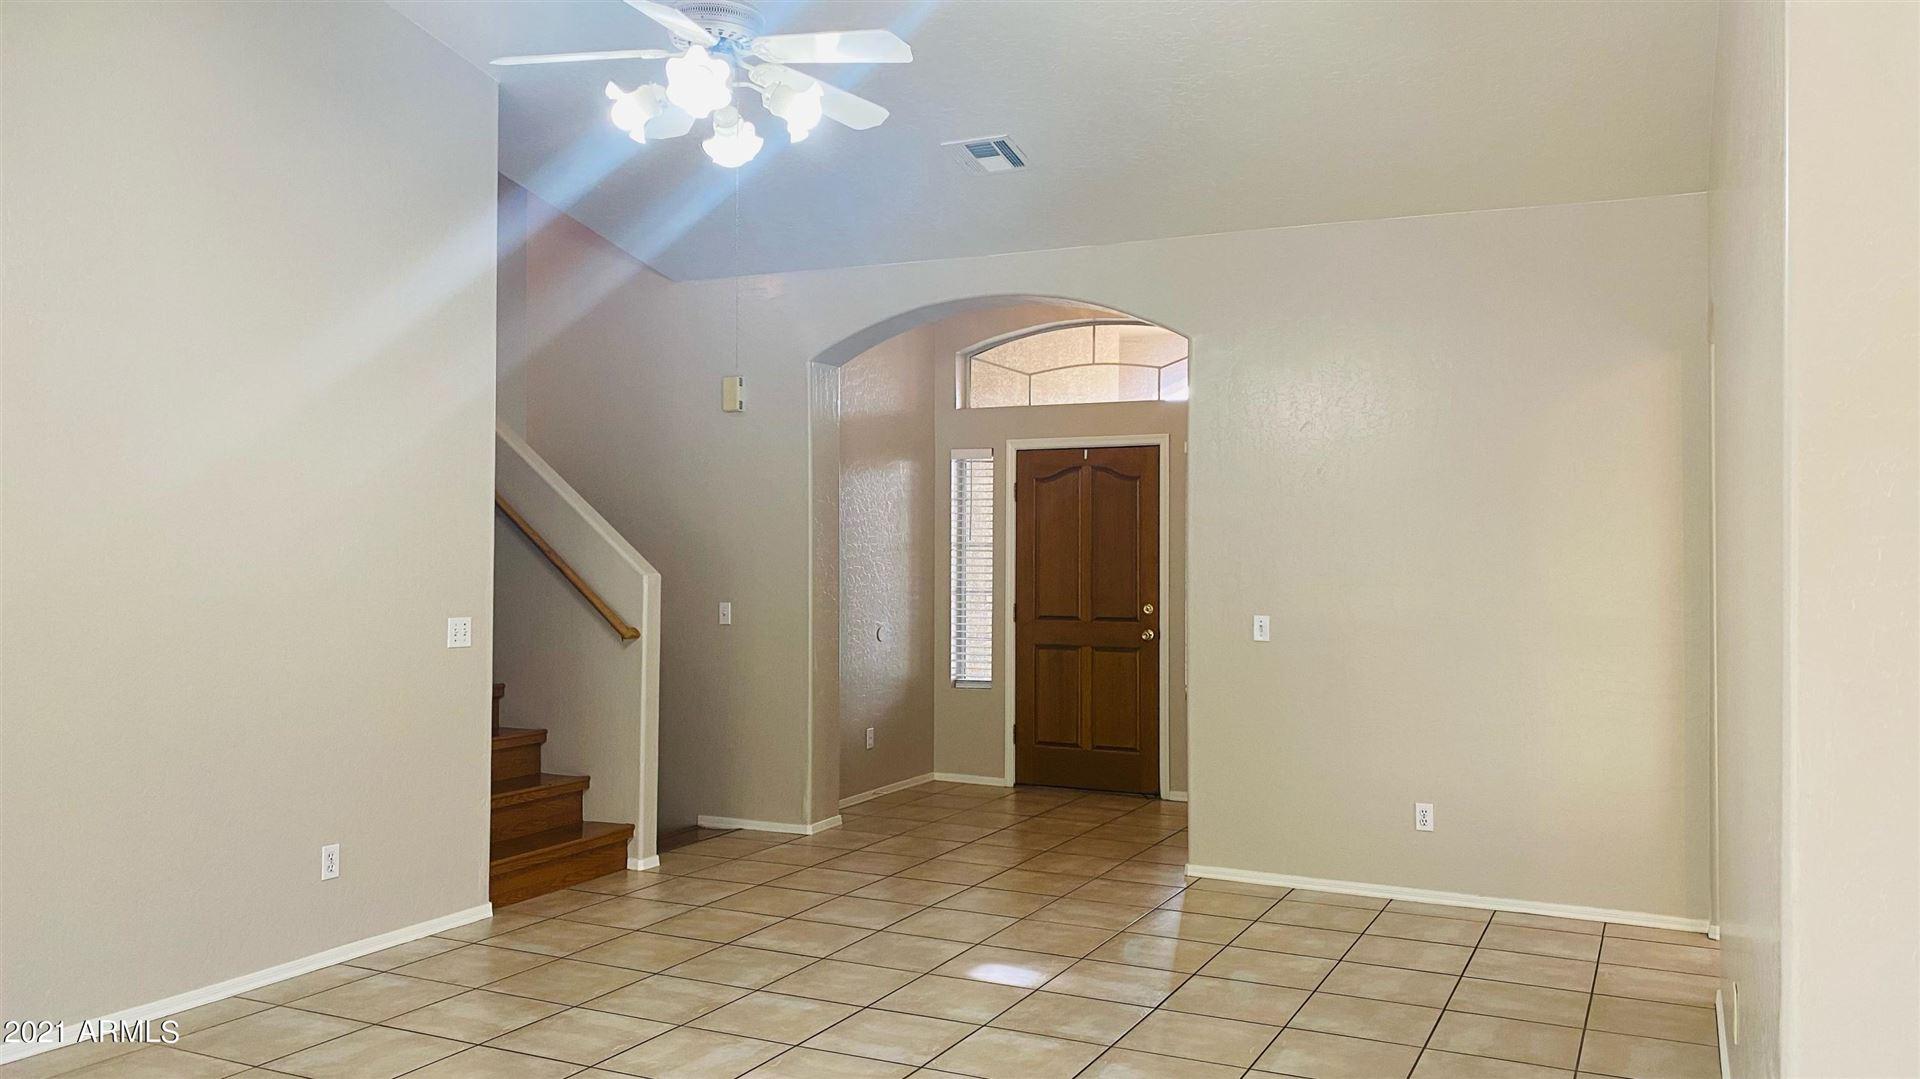 Photo of 5741 W ROSS Drive, Chandler, AZ 85226 (MLS # 6272615)